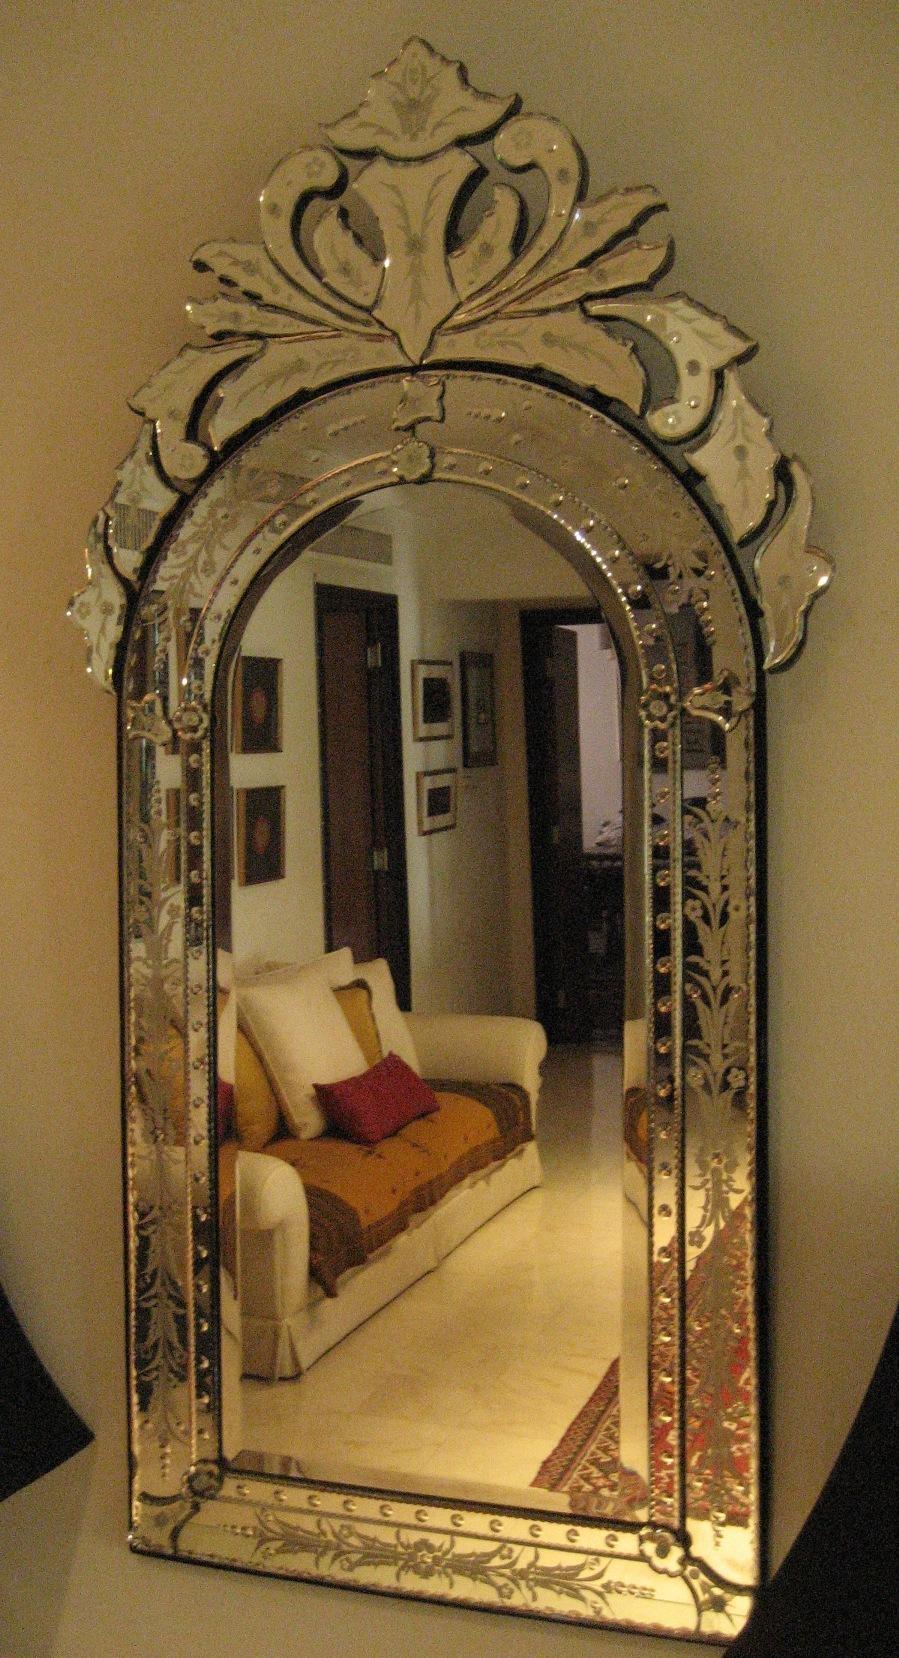 Venetian Mirrors | Home Decor & Furnishings Sale In Kuala Lumpur With Regard To Venetian Mirrors For Sale (Image 15 of 20)